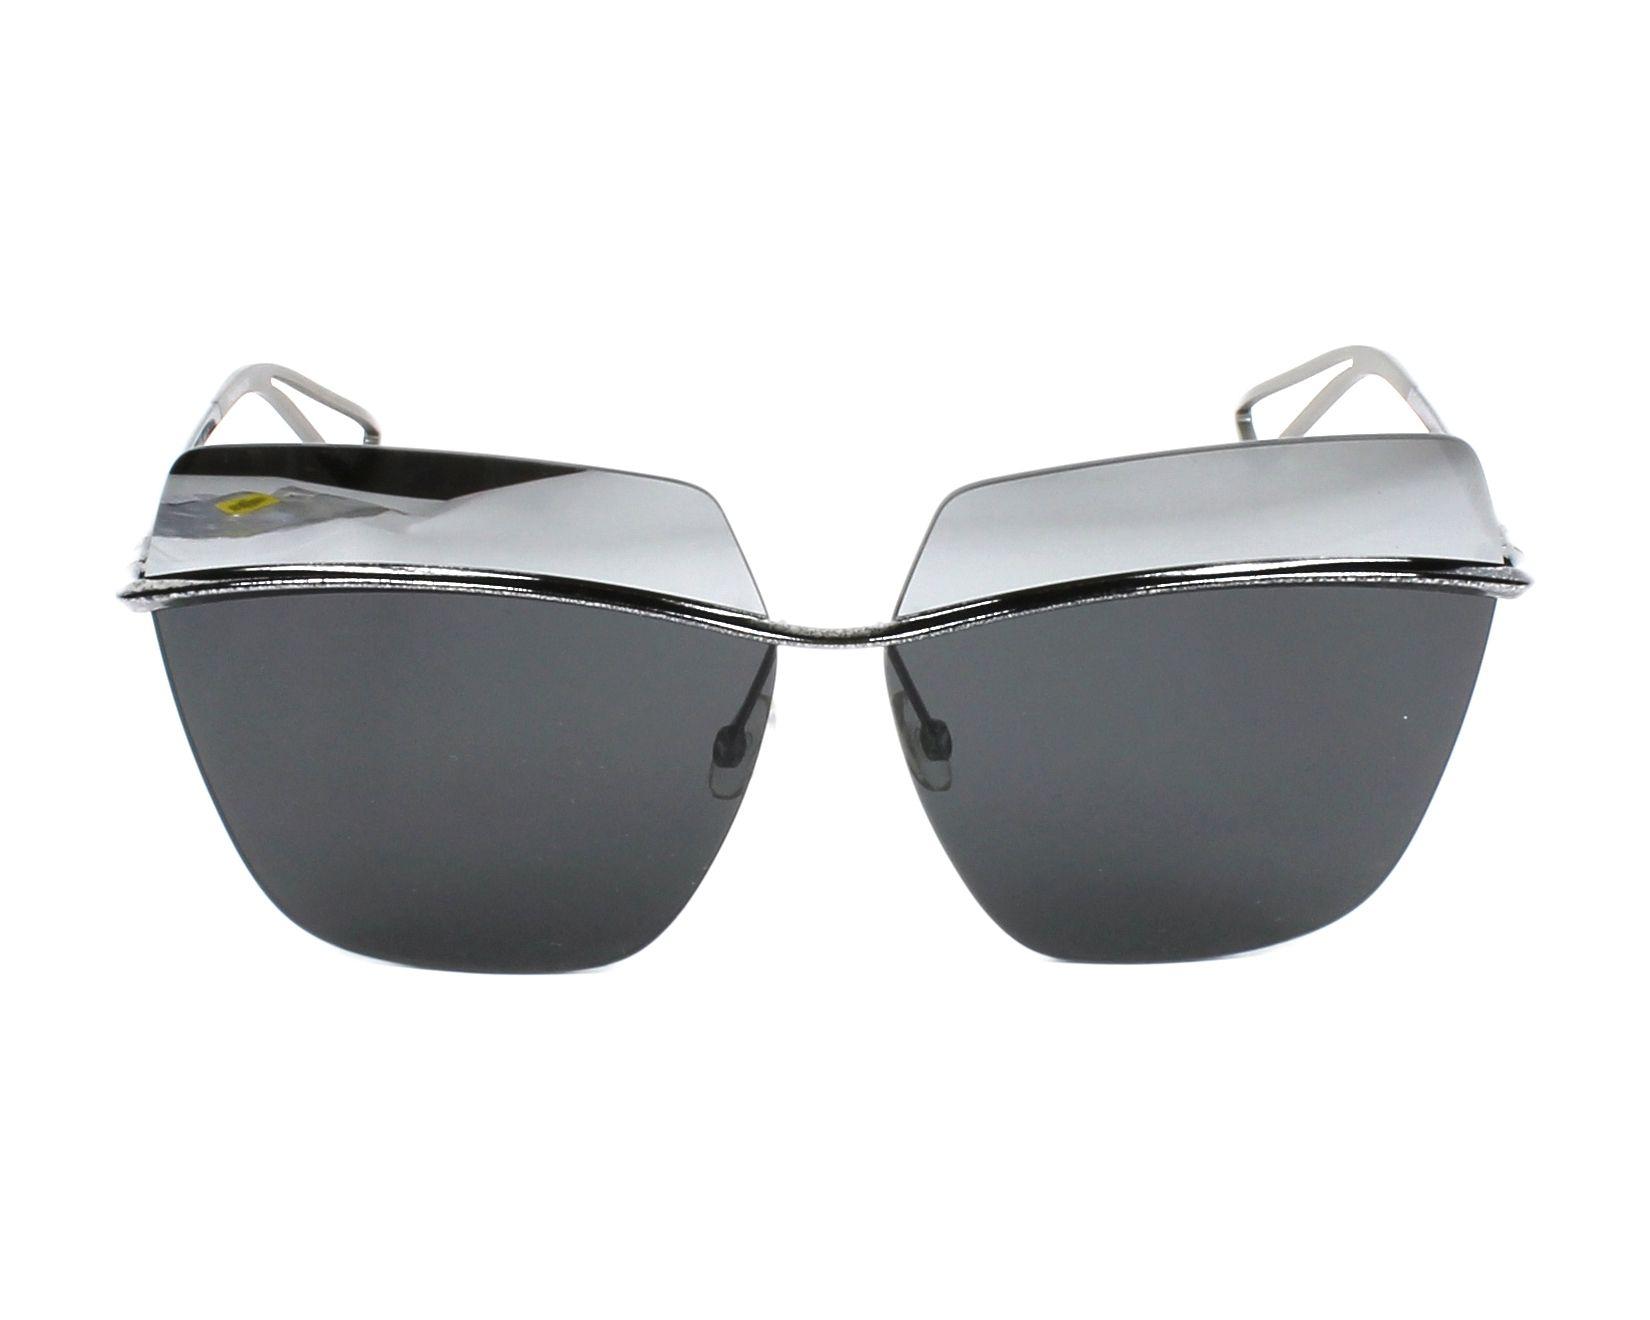 b12d46164ada Sunglasses Christian Dior DIORMETALLIC SSP KW 63-10 Silver Blue front view